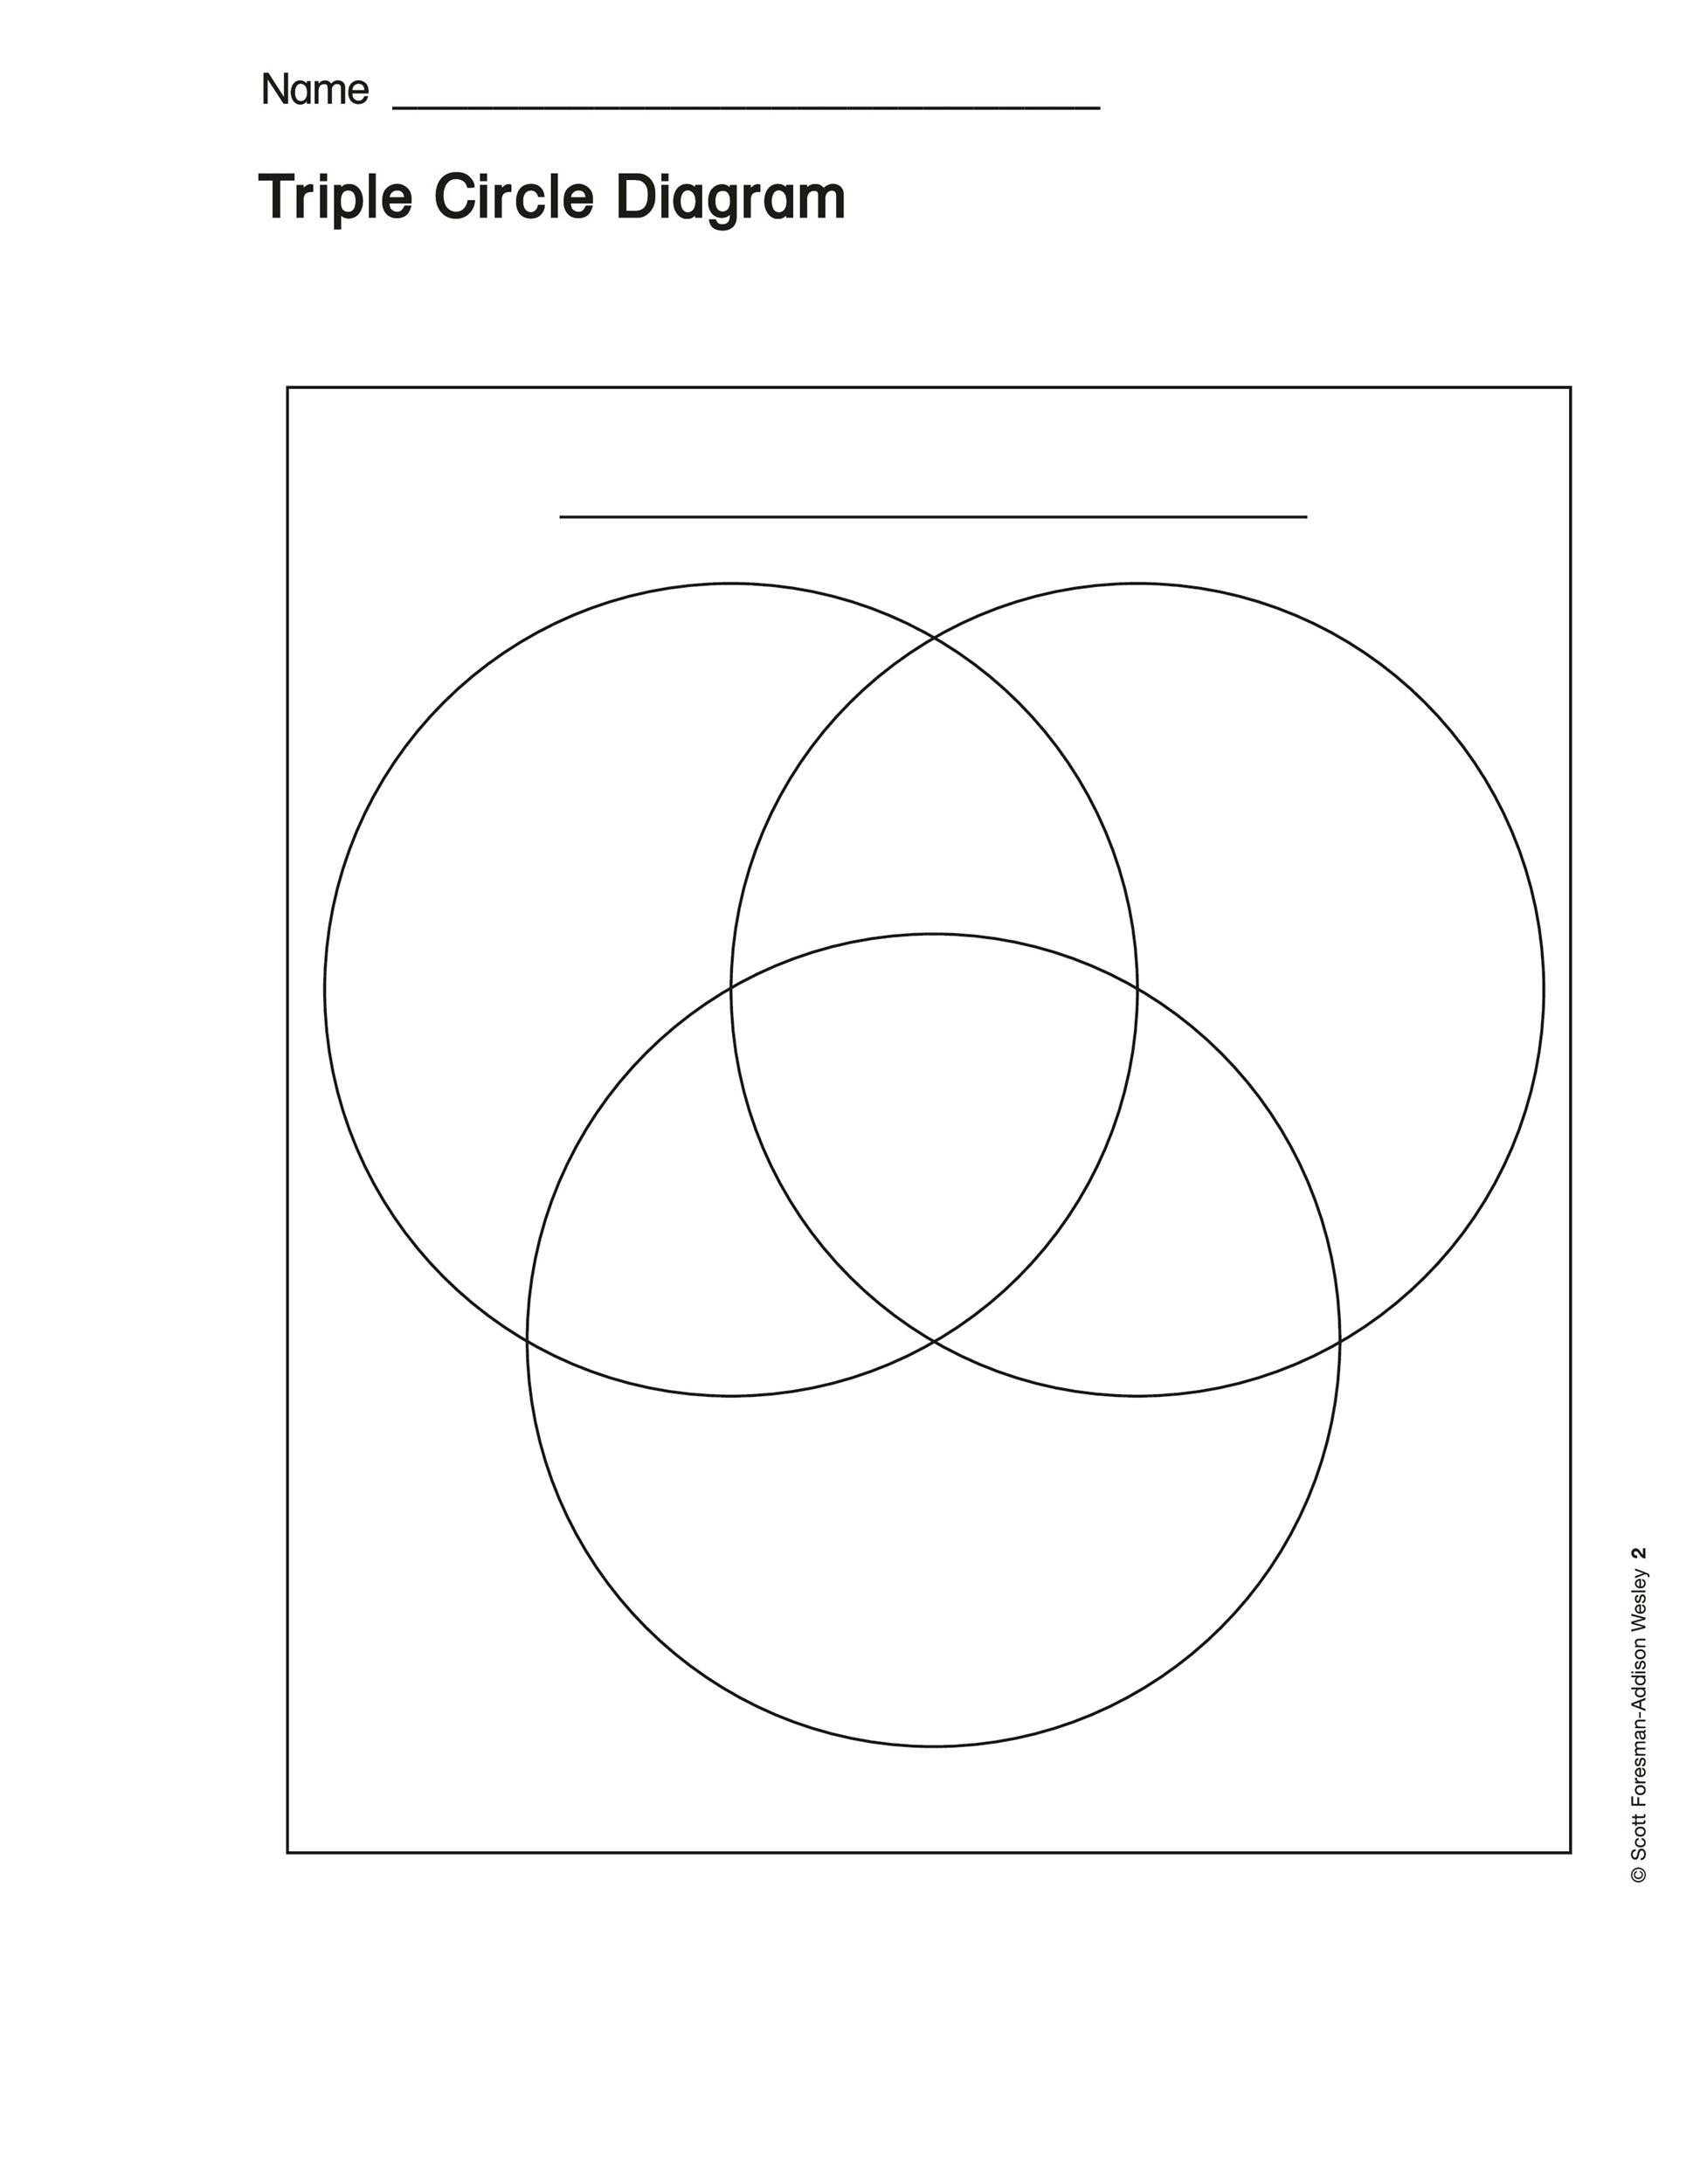 Primary Venn Diagram Template : 29 Wiring Diagram Images